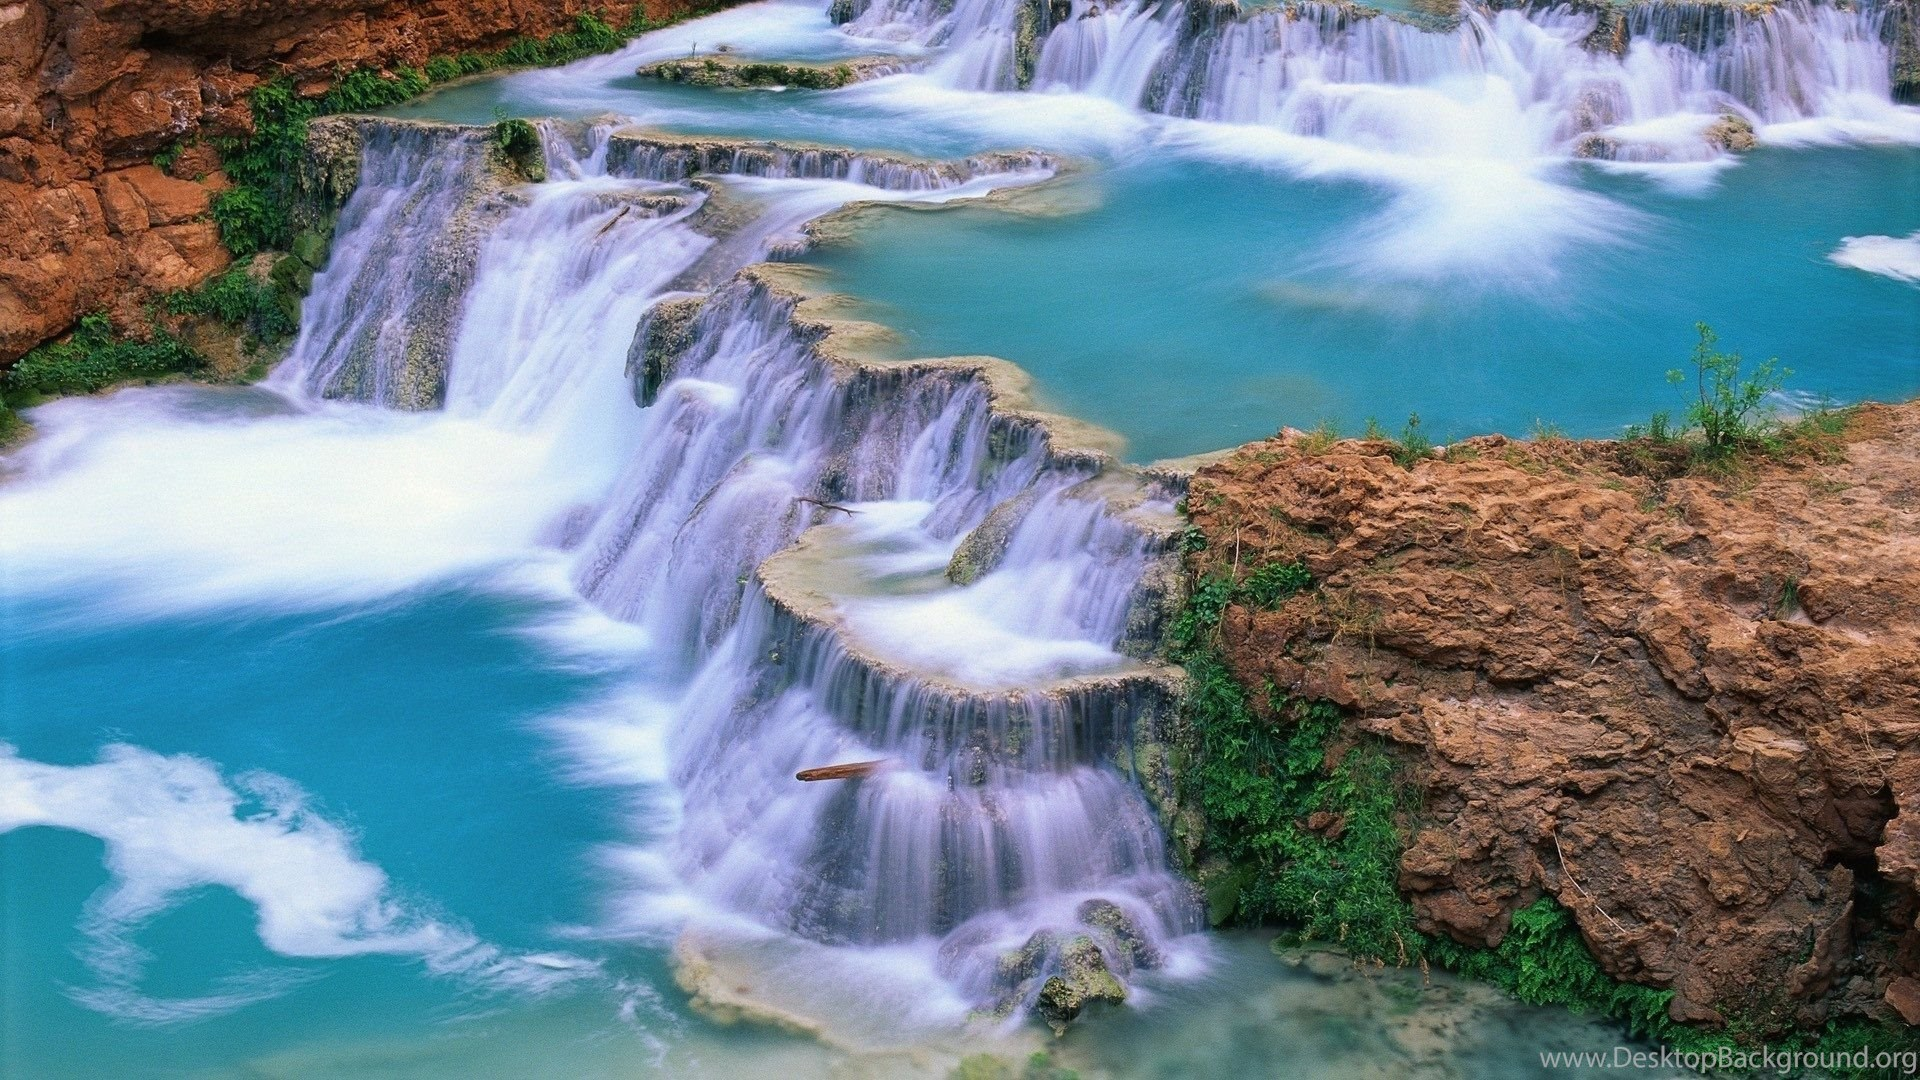 Waterfalls Wallpapers 1080p: Waterfall Wallpapers HD Free HD 1080P For Desktop Desktop